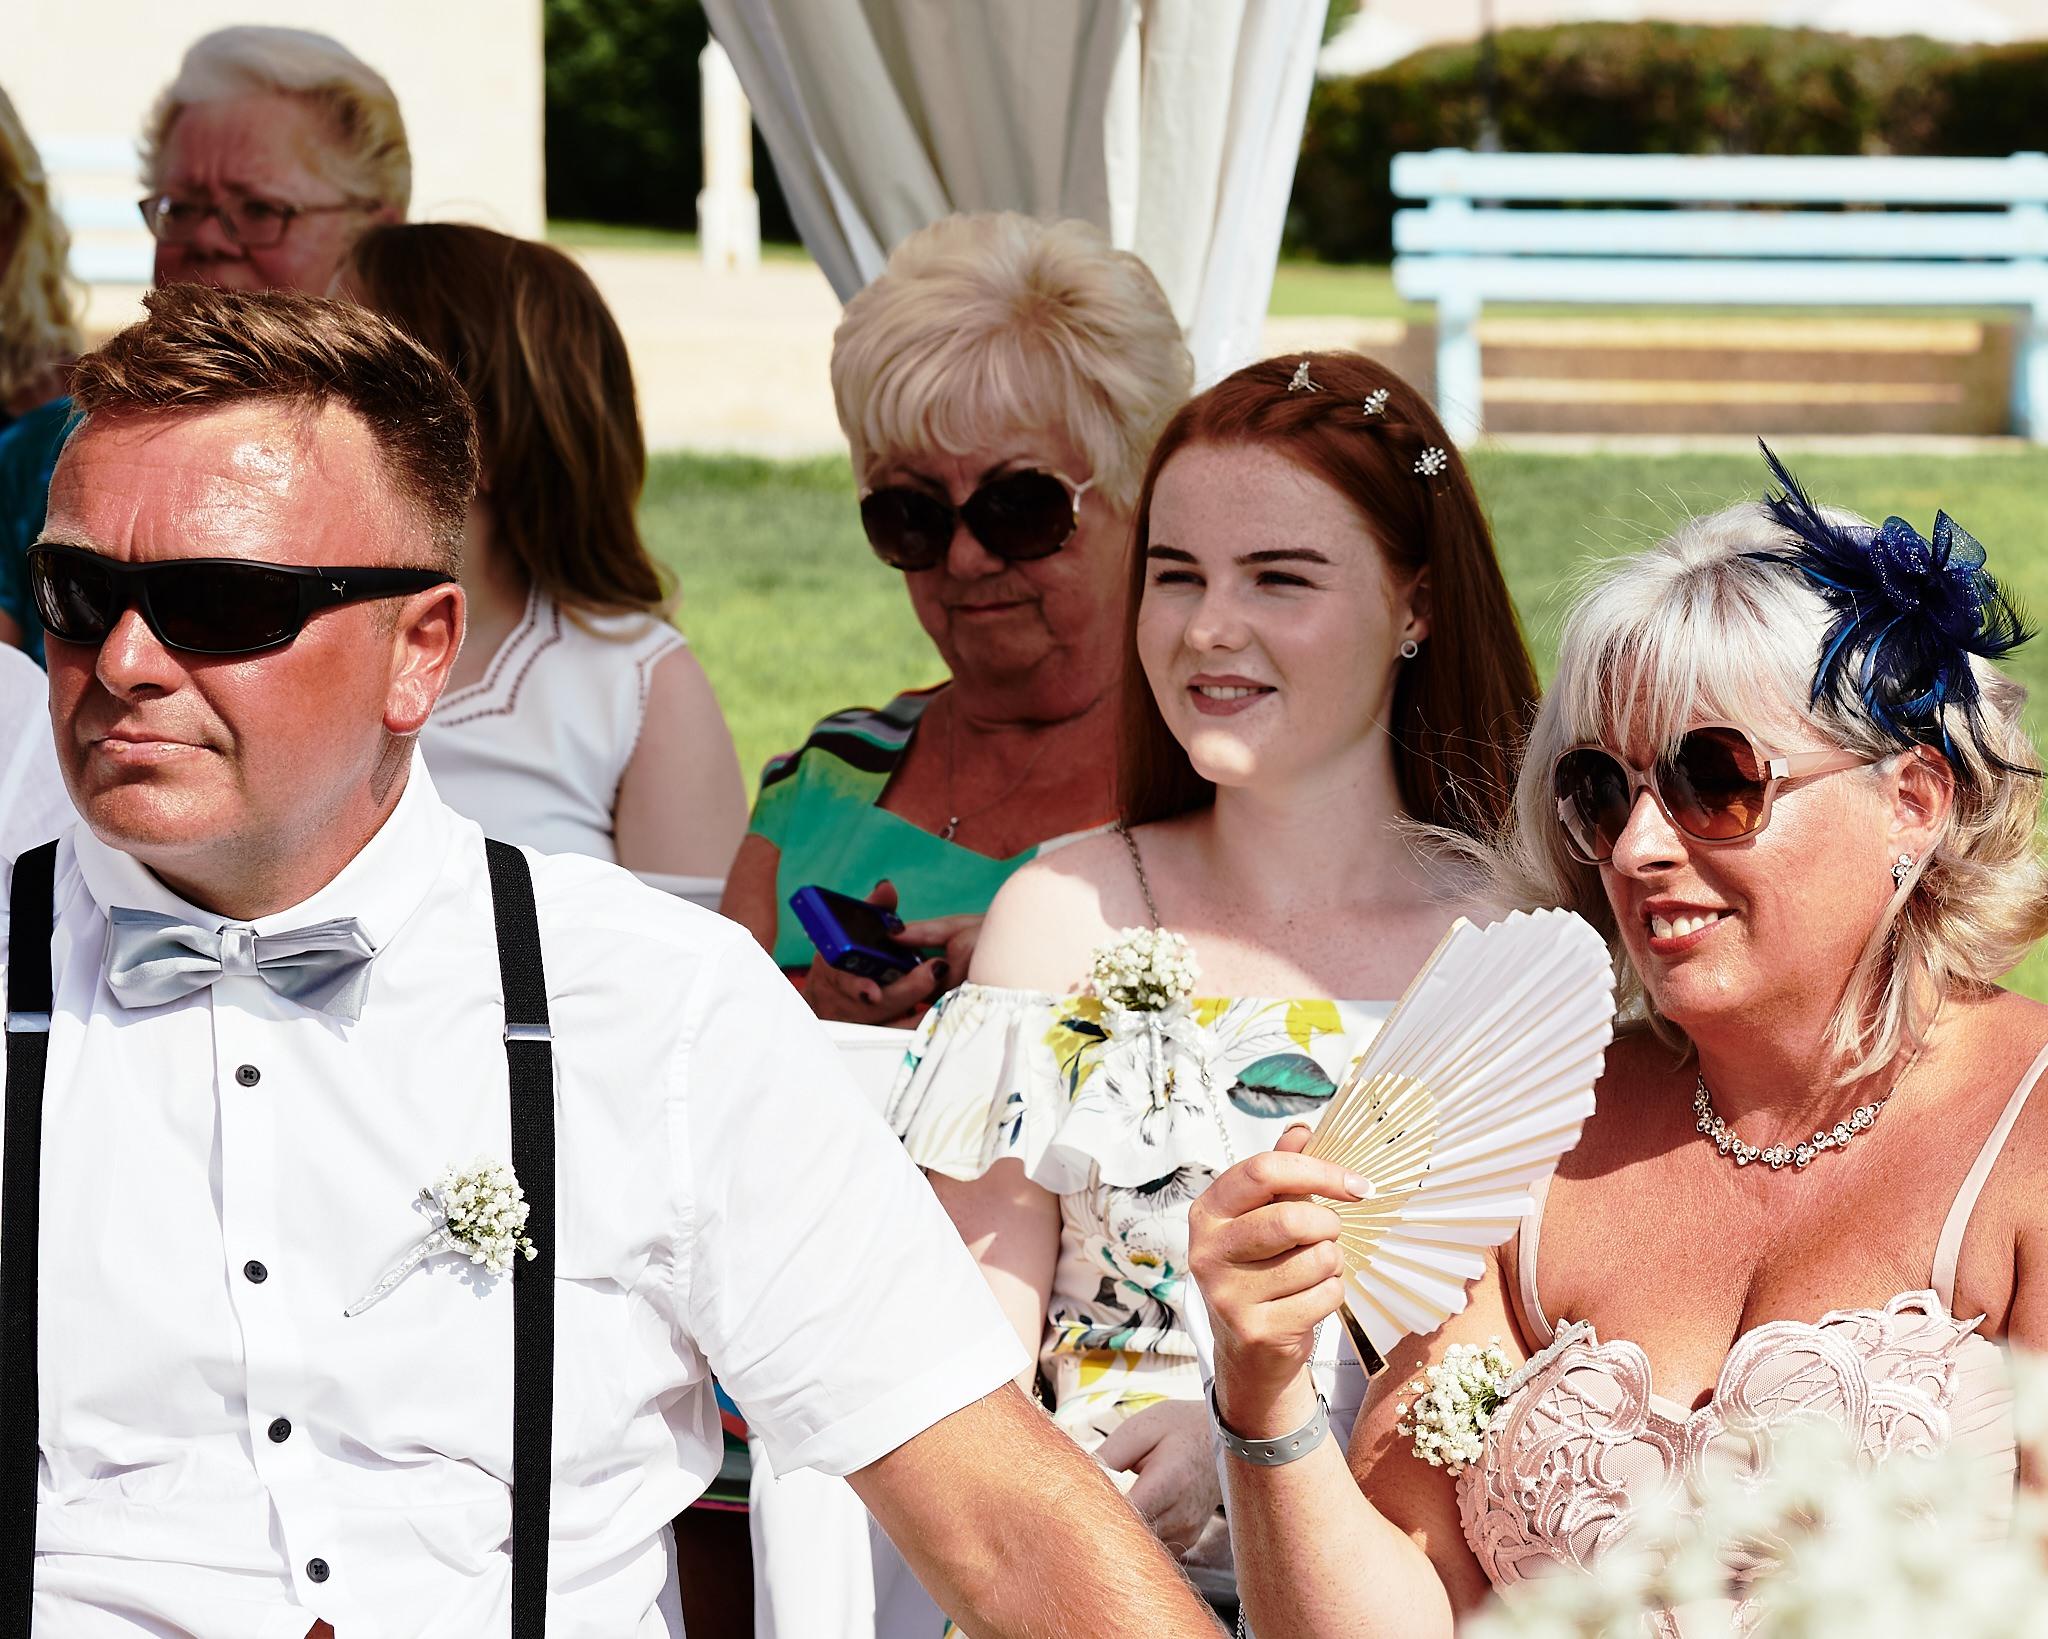 Wedding photograph, taken in Cyprus by Richard King